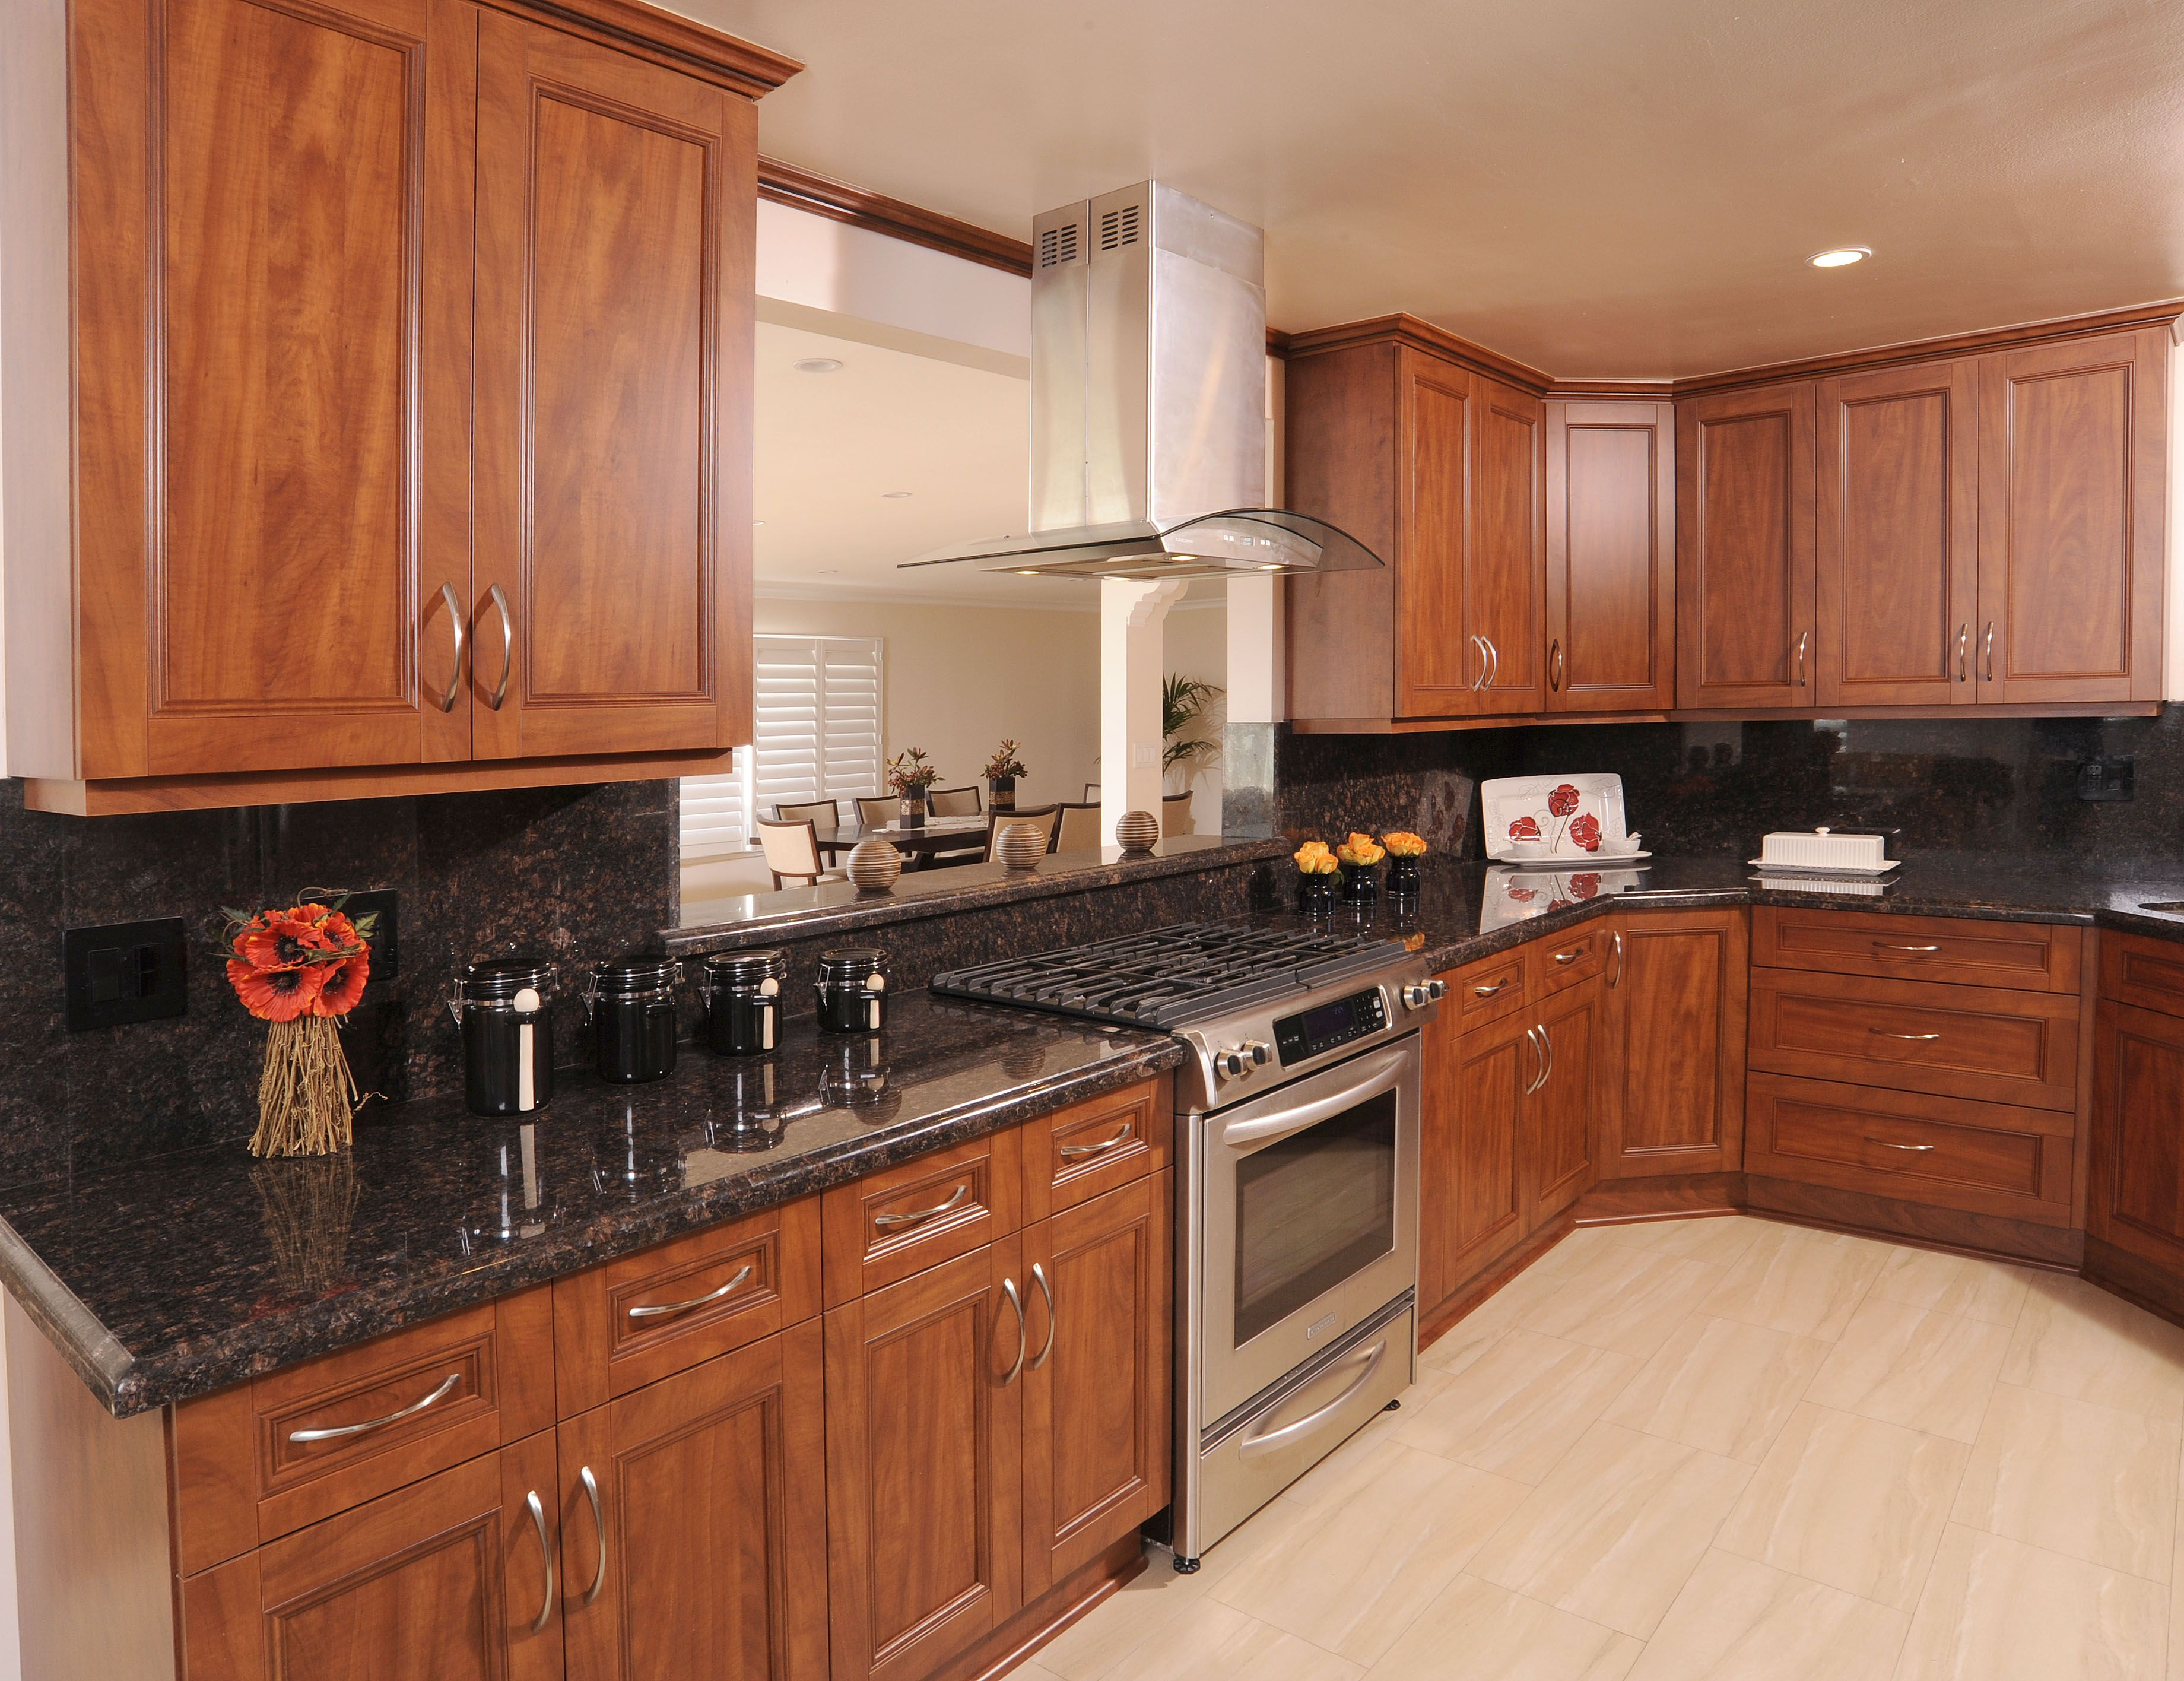 Kitchen Featuring Decore Canova Deco Door Kitchen Cabinet Styles Custom Cabinet Doors Kitchen Cabinet Remodel